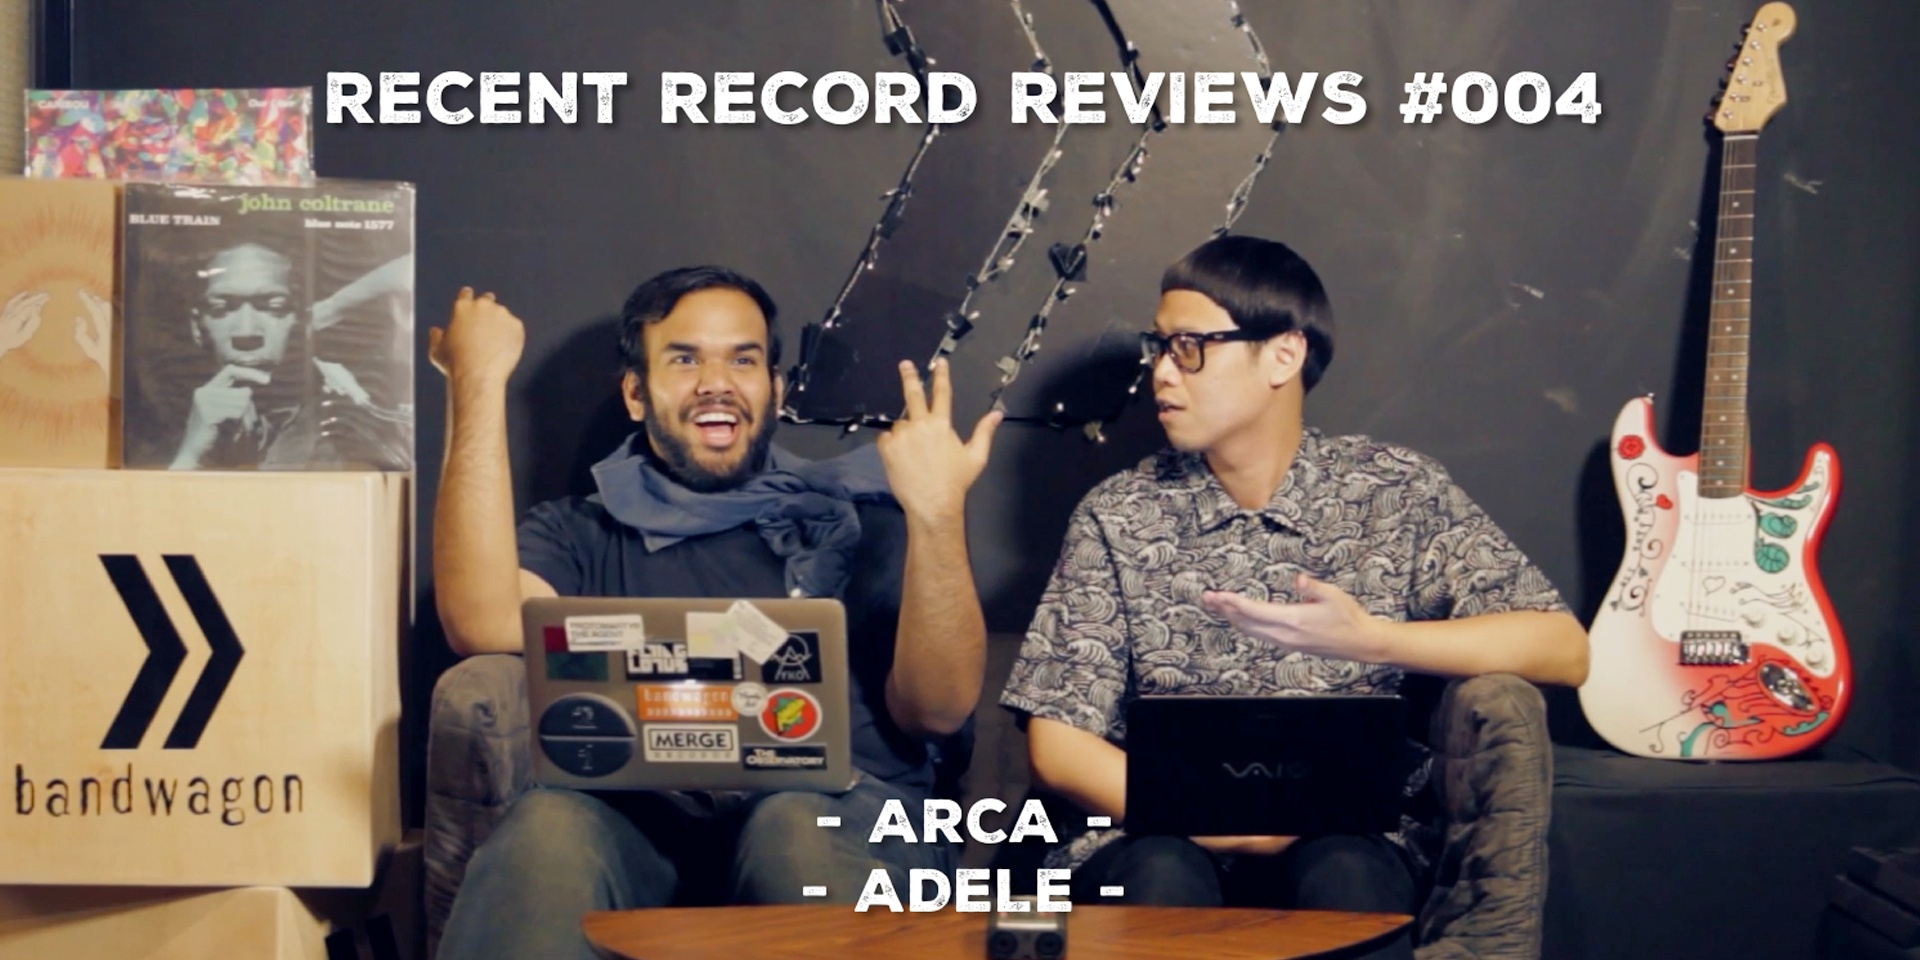 WATCH: Bandwagon Recent Record Reviews #004 - Arca, Adele